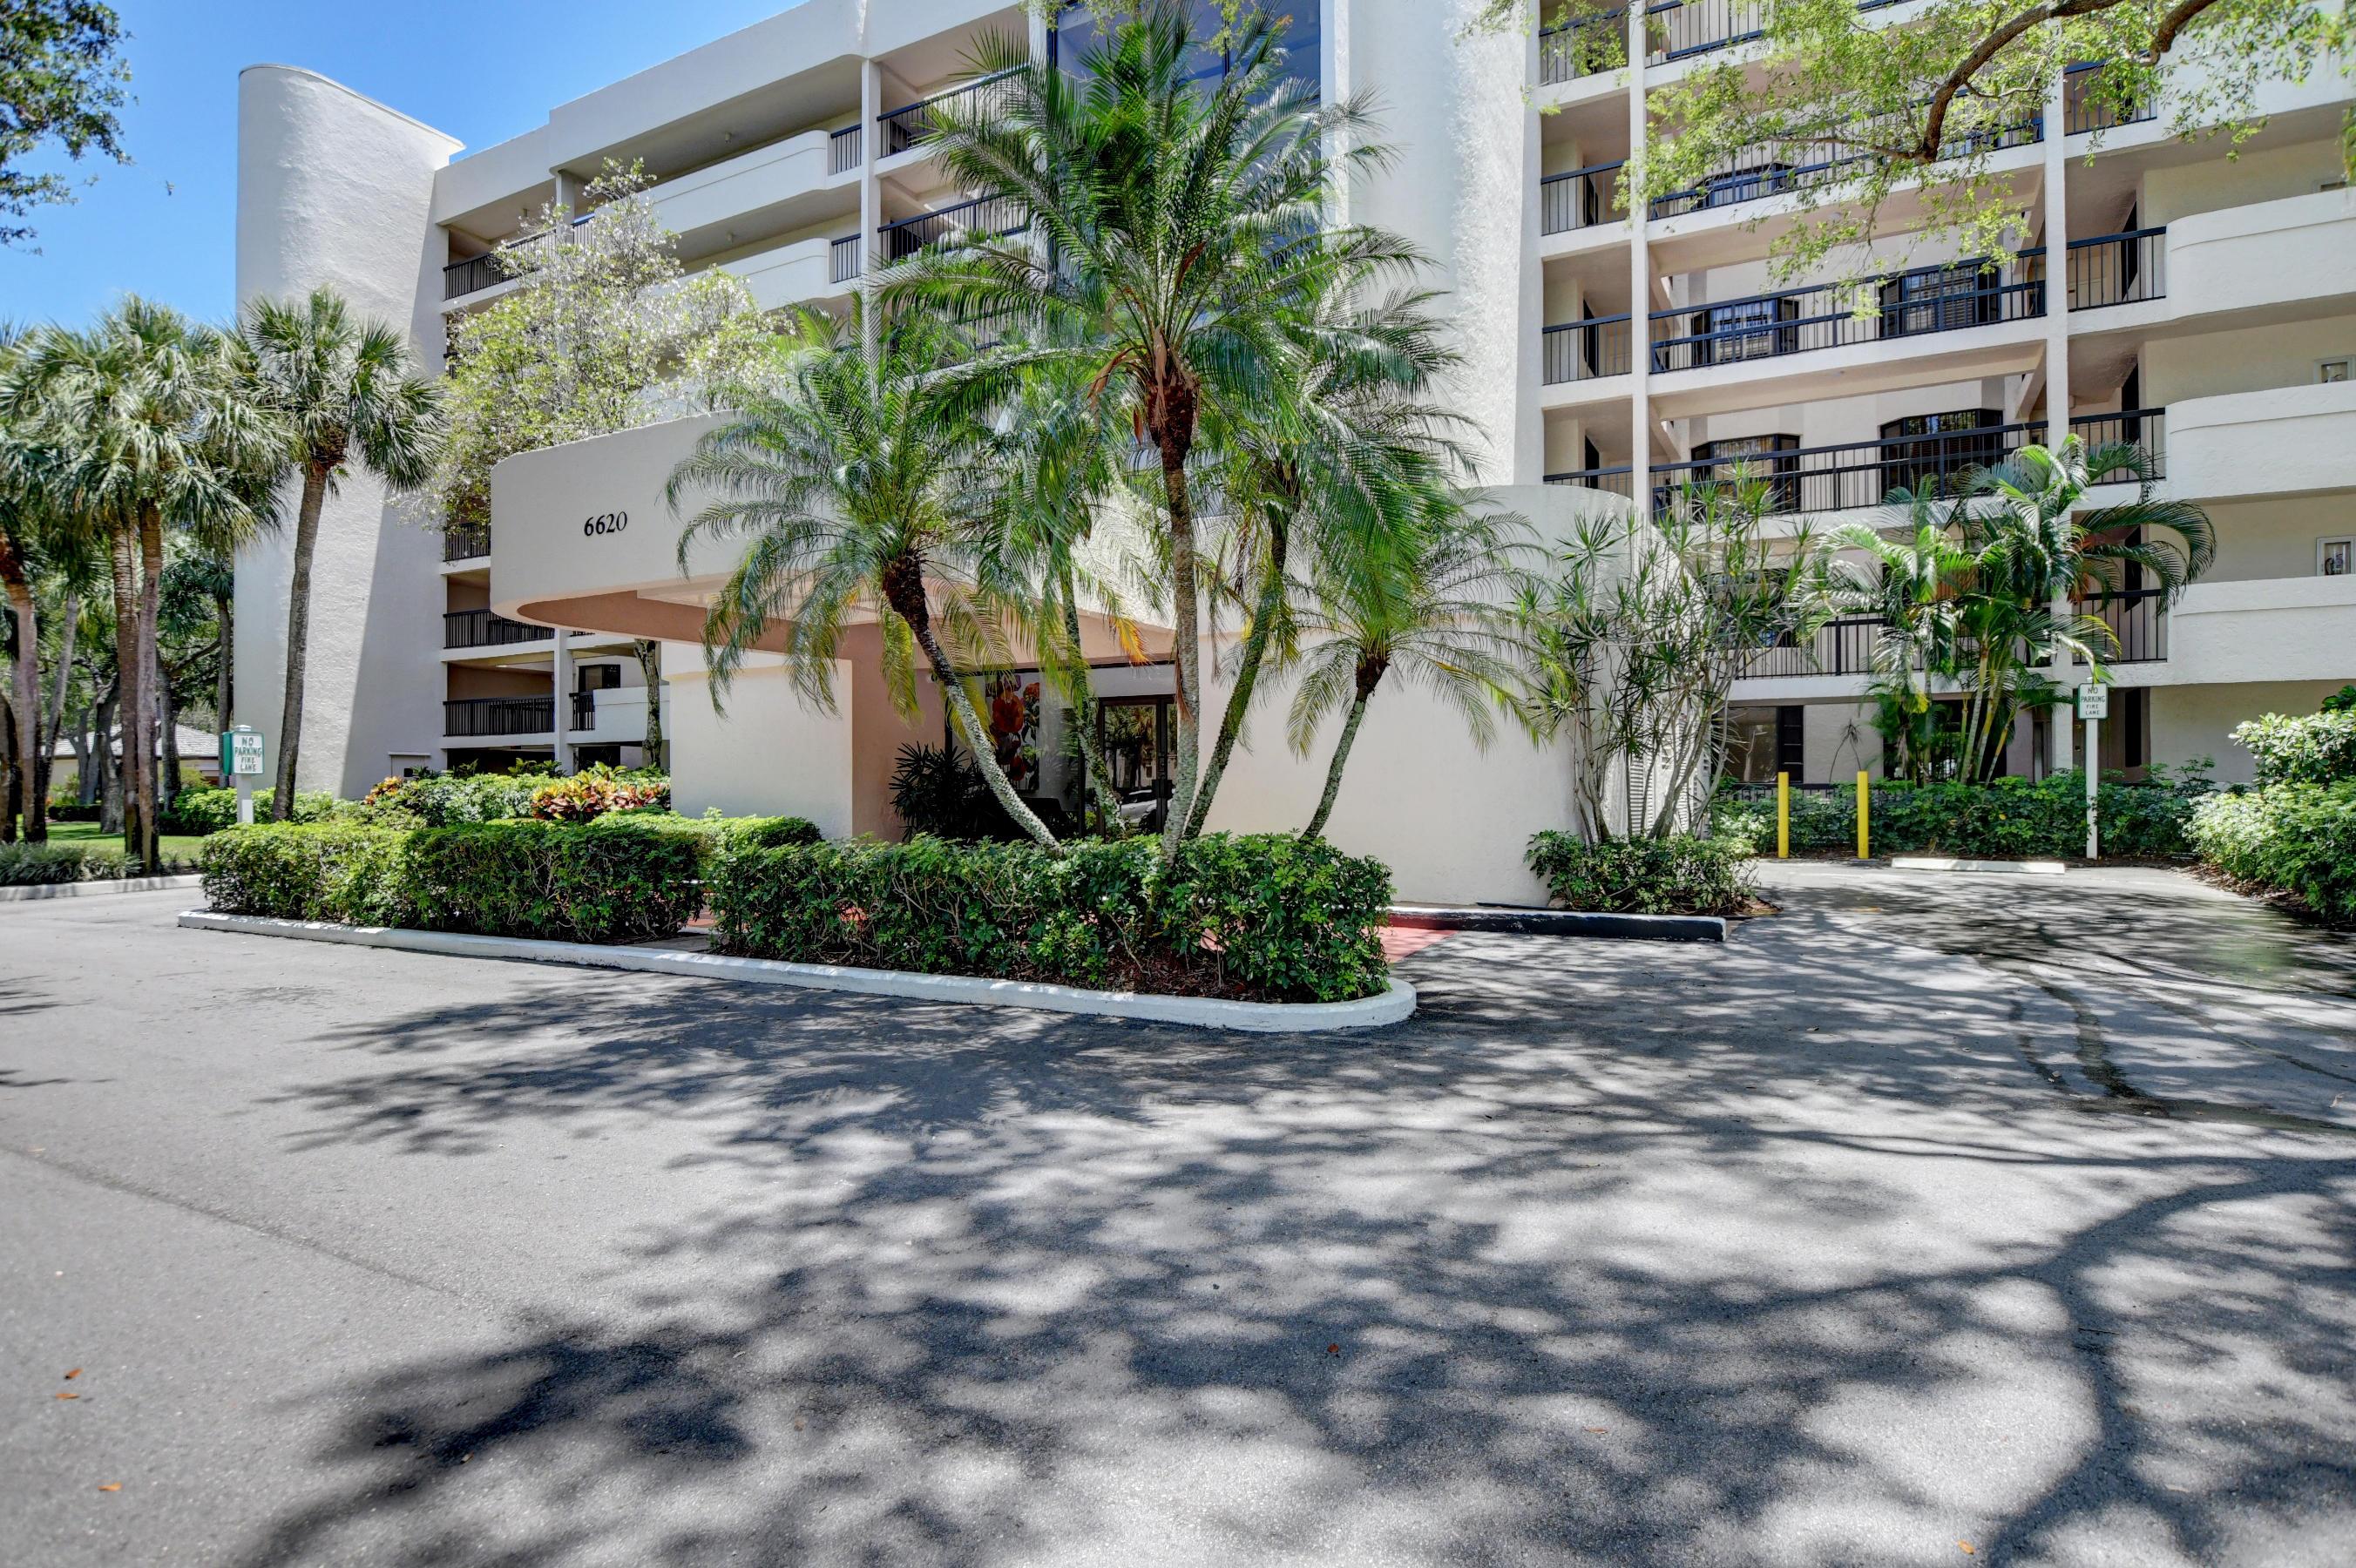 6620  Boca Del Mar Drive 208 For Sale 10715494, FL